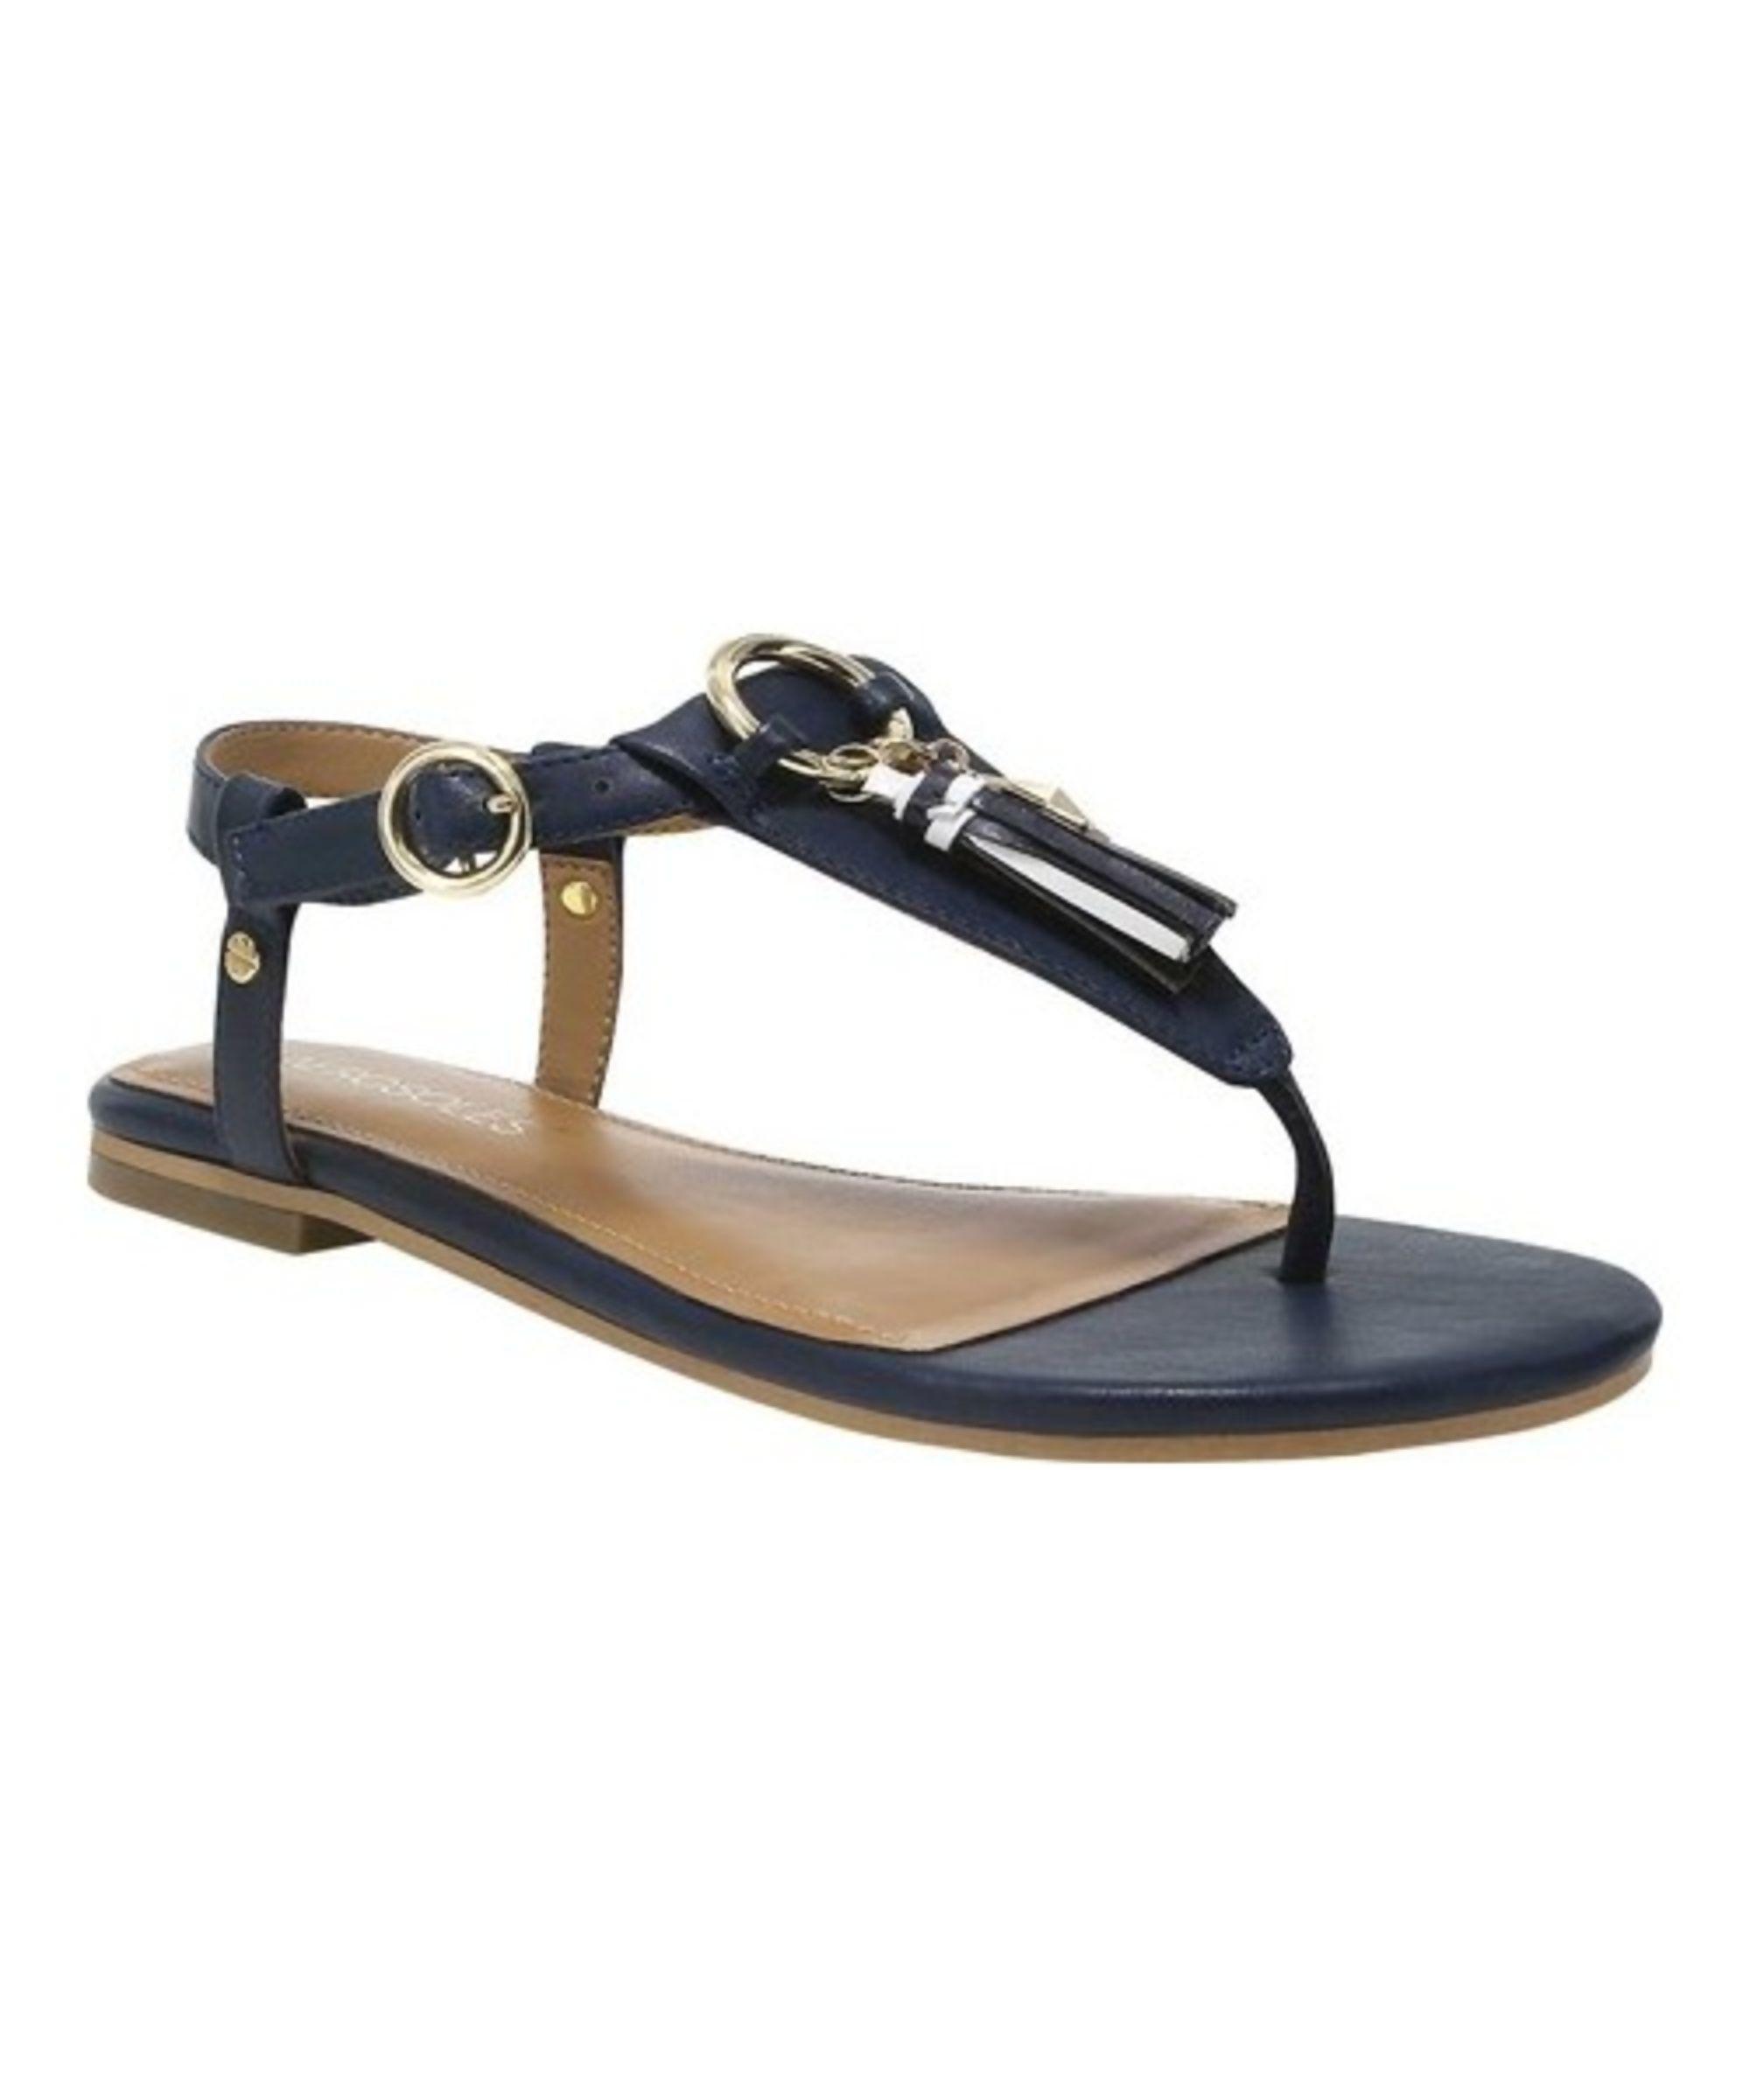 20182017 Sandals Aerosoles Womens Good Chlue Gladiator Sandal Outlet Store